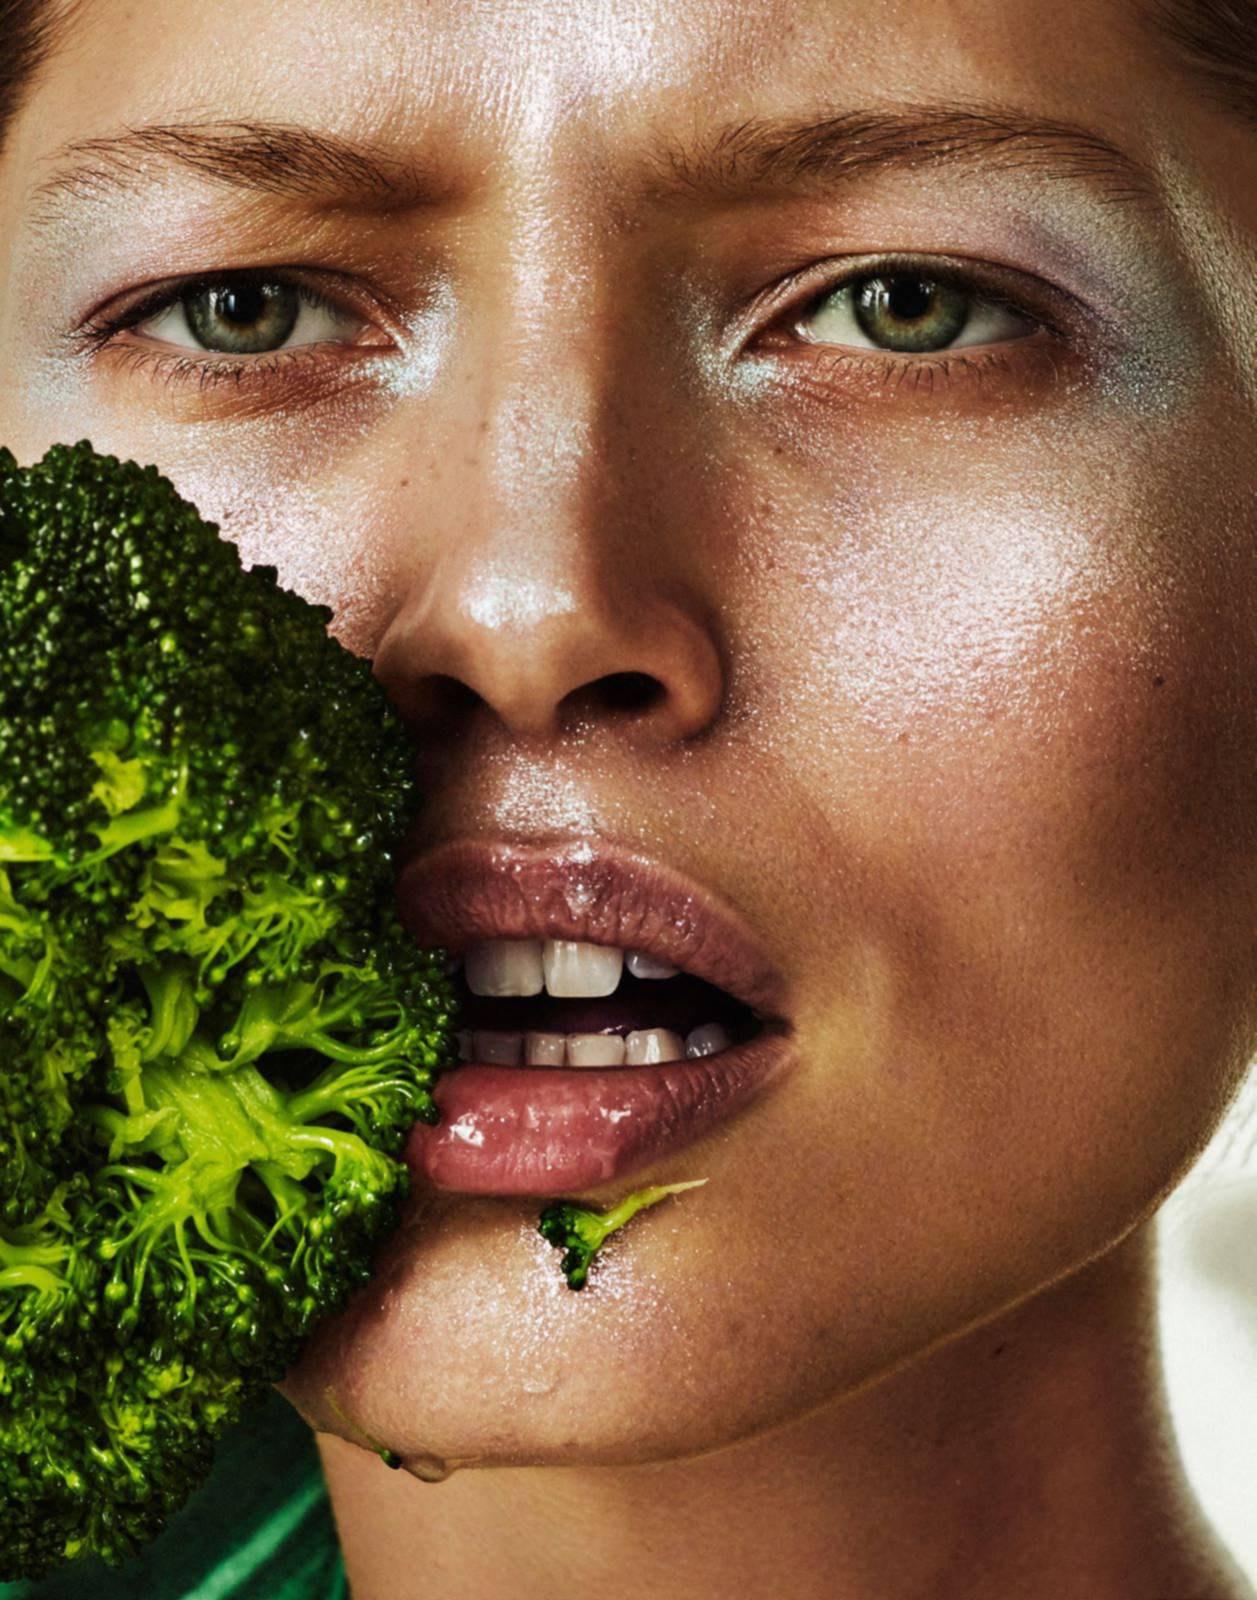 The New Green Power для Vogue Paris May 2017 / Модель Hana Jirickova Фотограф Alique